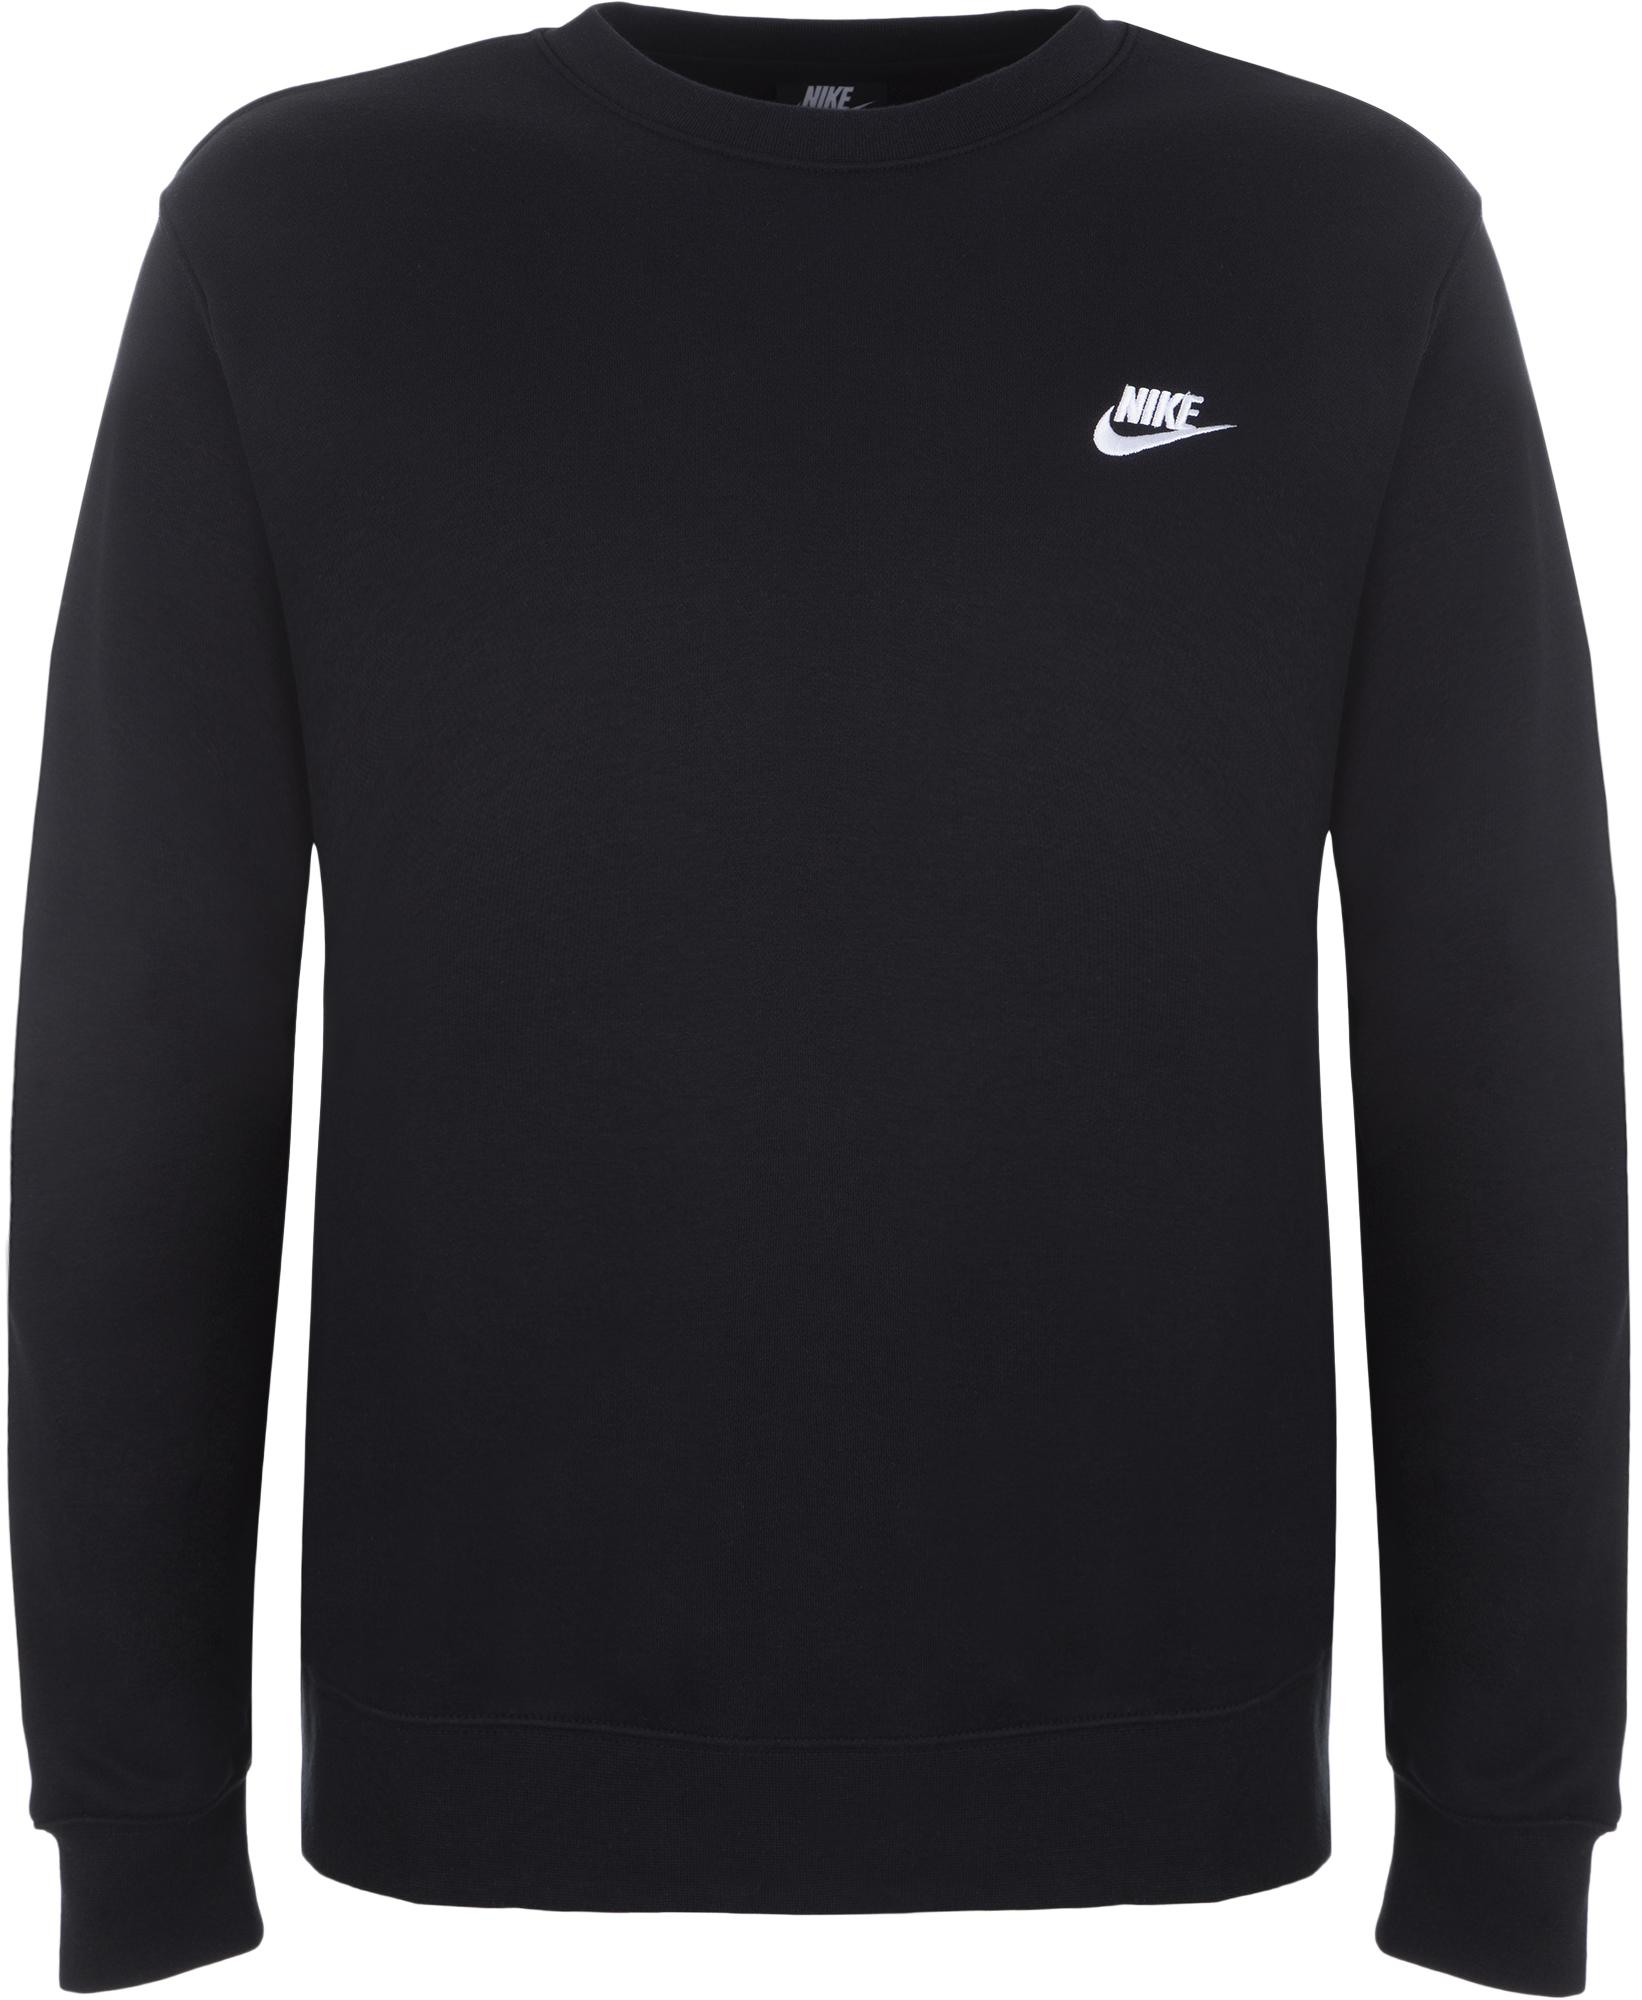 Фото - Nike Свитшот мужской Nike Sportswear Club, размер 44-46 nike свитшот мужской nike sportswear just do it размер 52 54